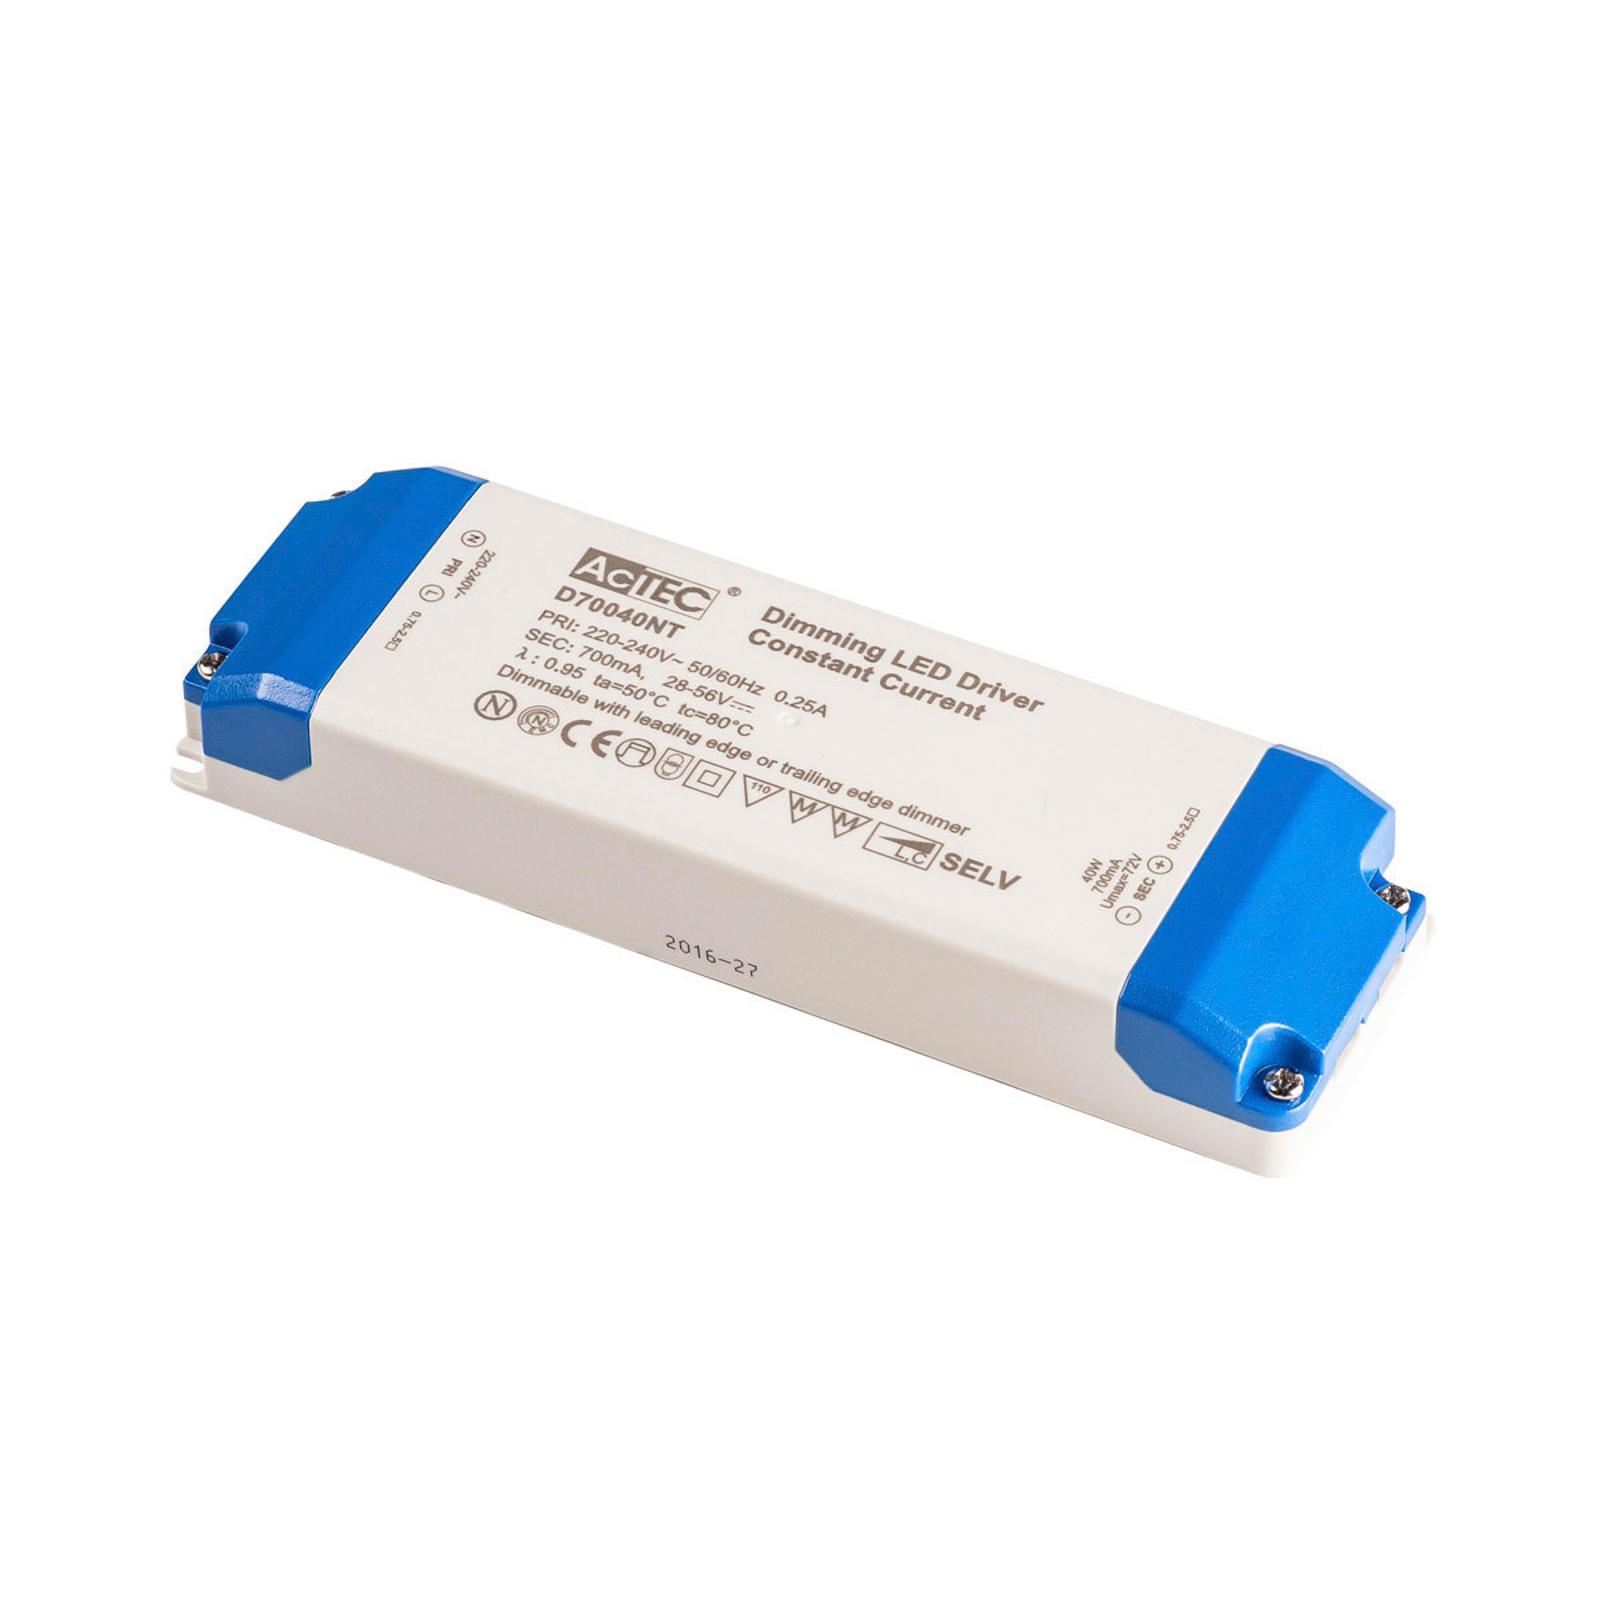 SLV Triac LED-Treiber 39W, dimmbar